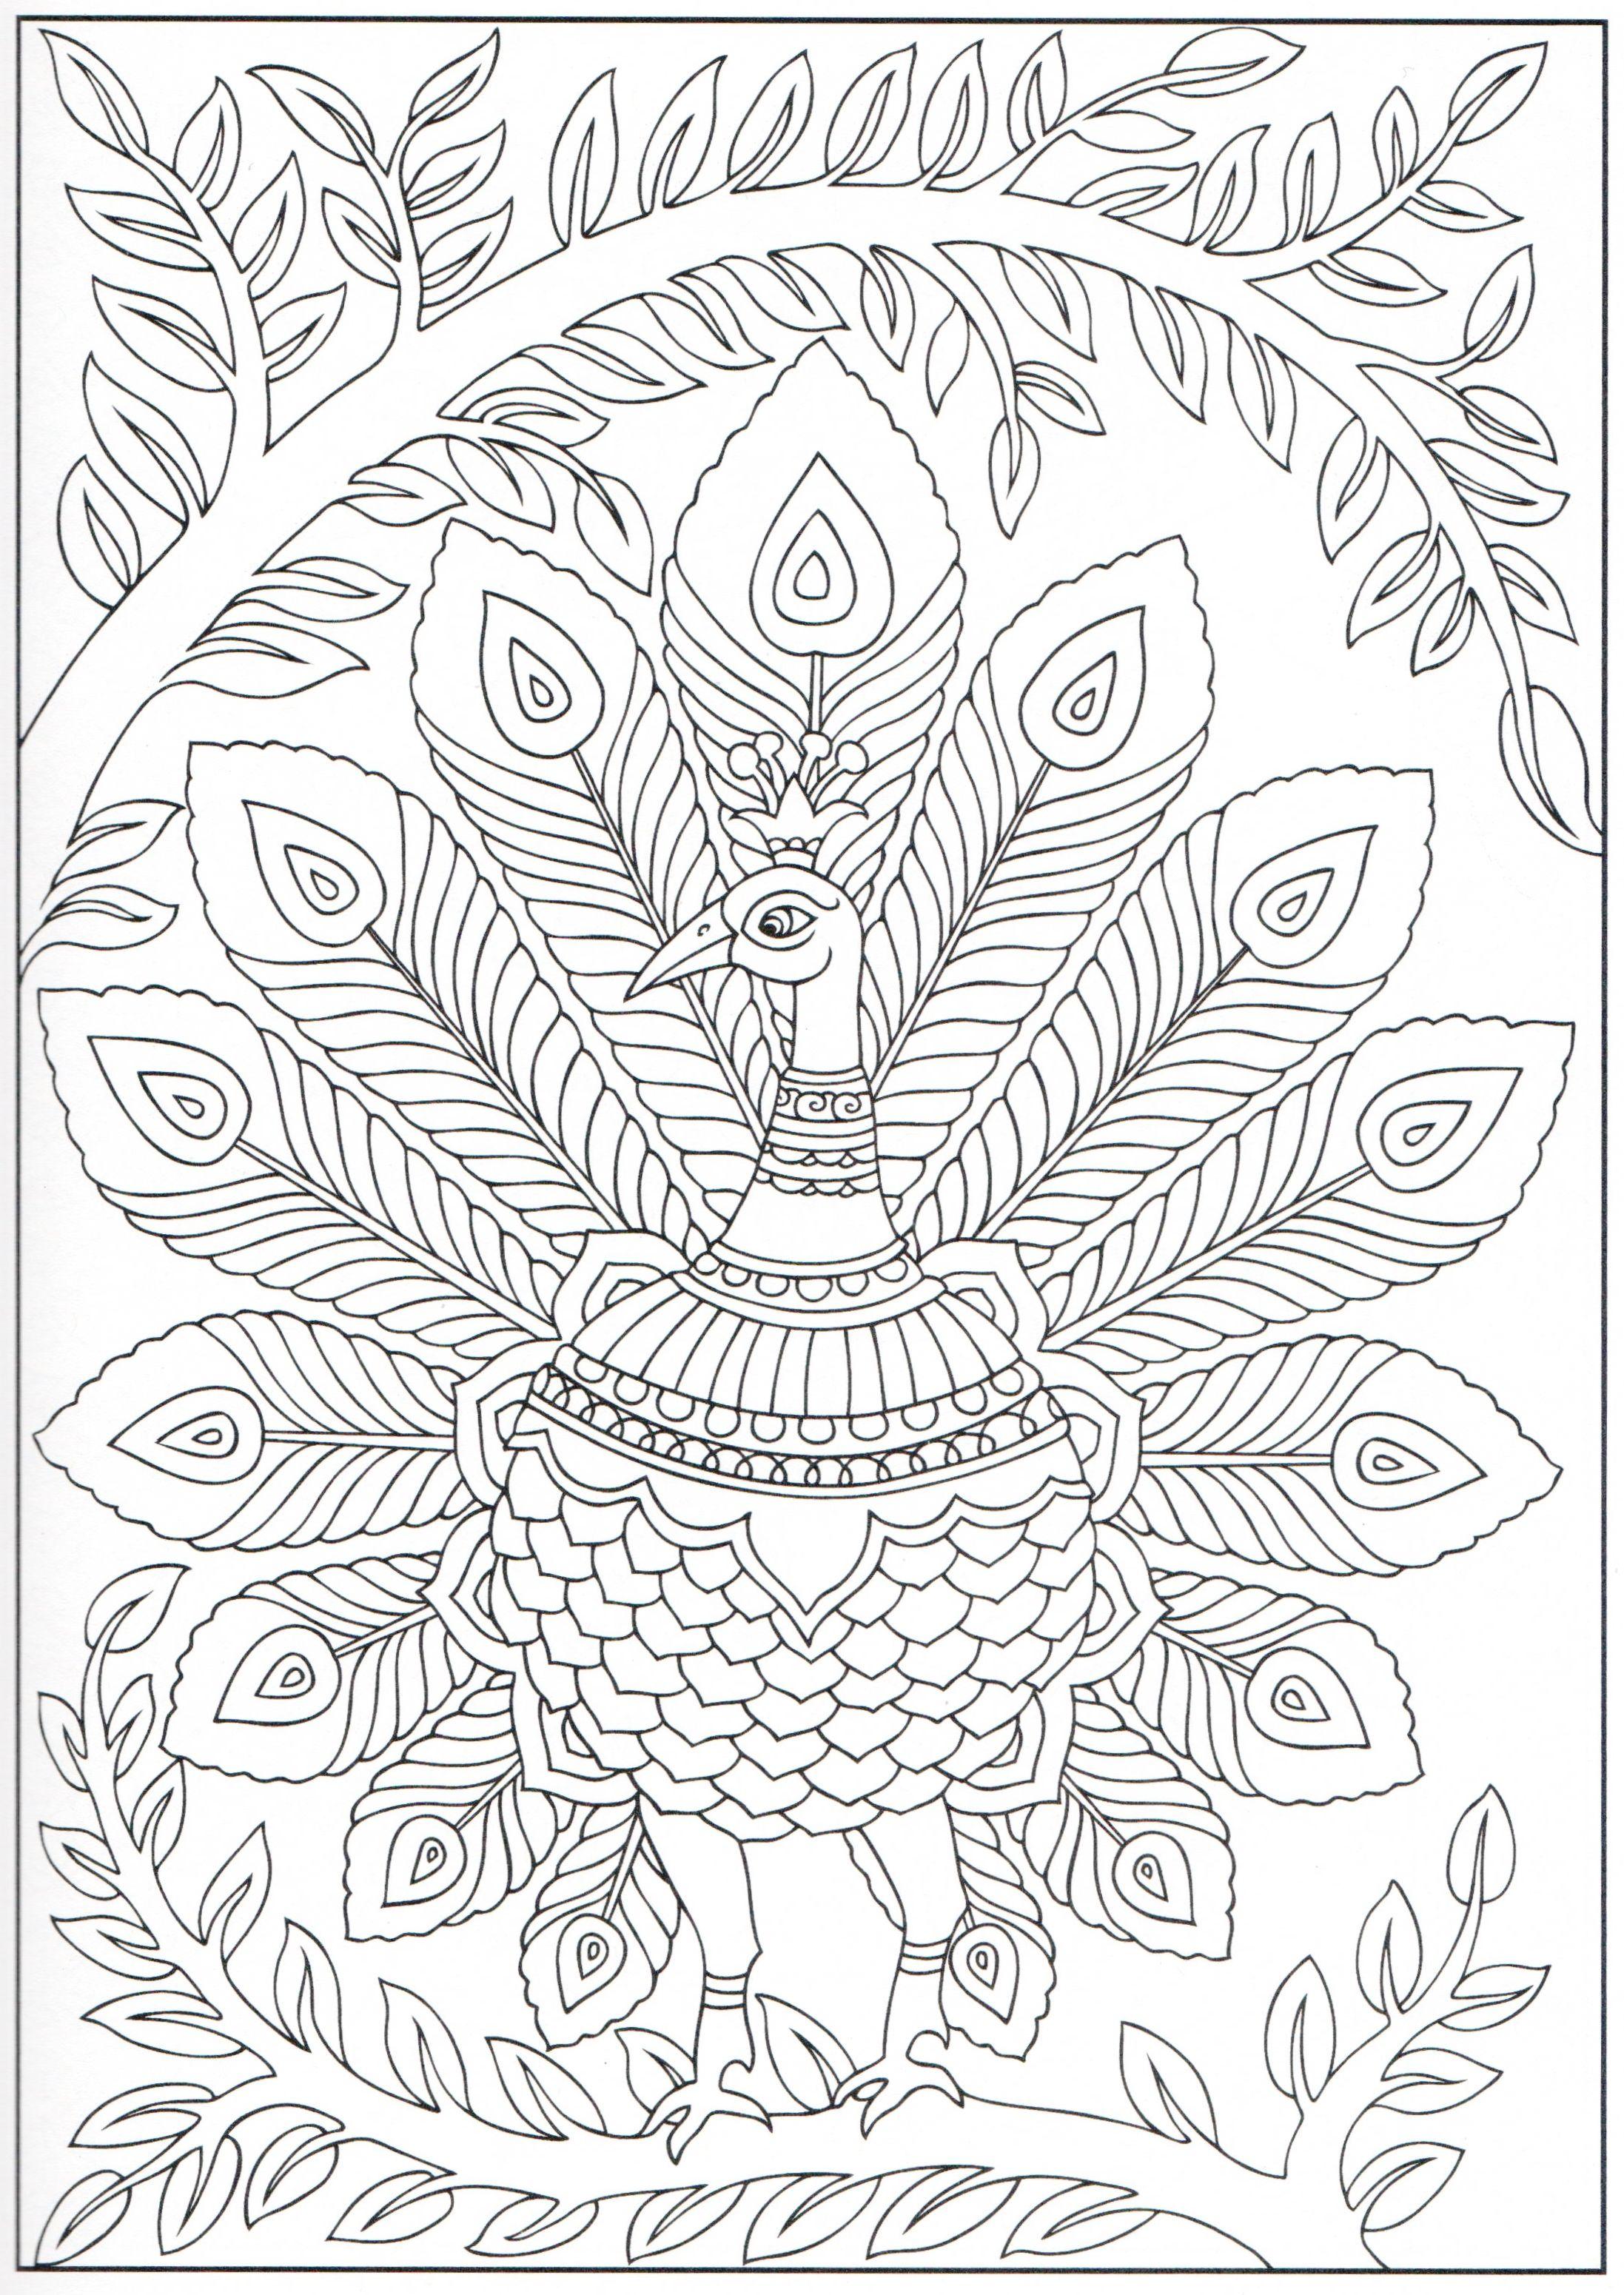 Peacock coloring page 12/31 | Colouring | Pinterest | Mandalas ...